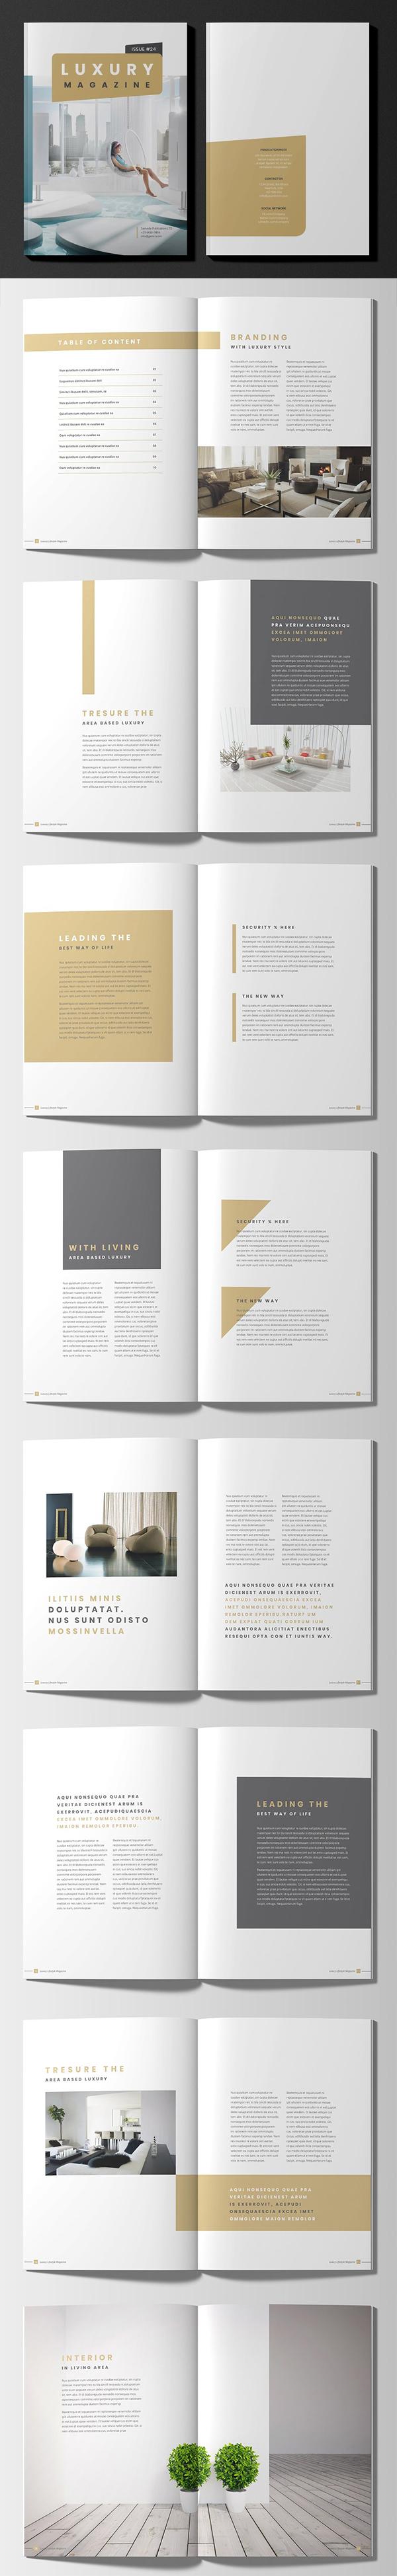 Luxury Lifestyle Magazine Brochure Template